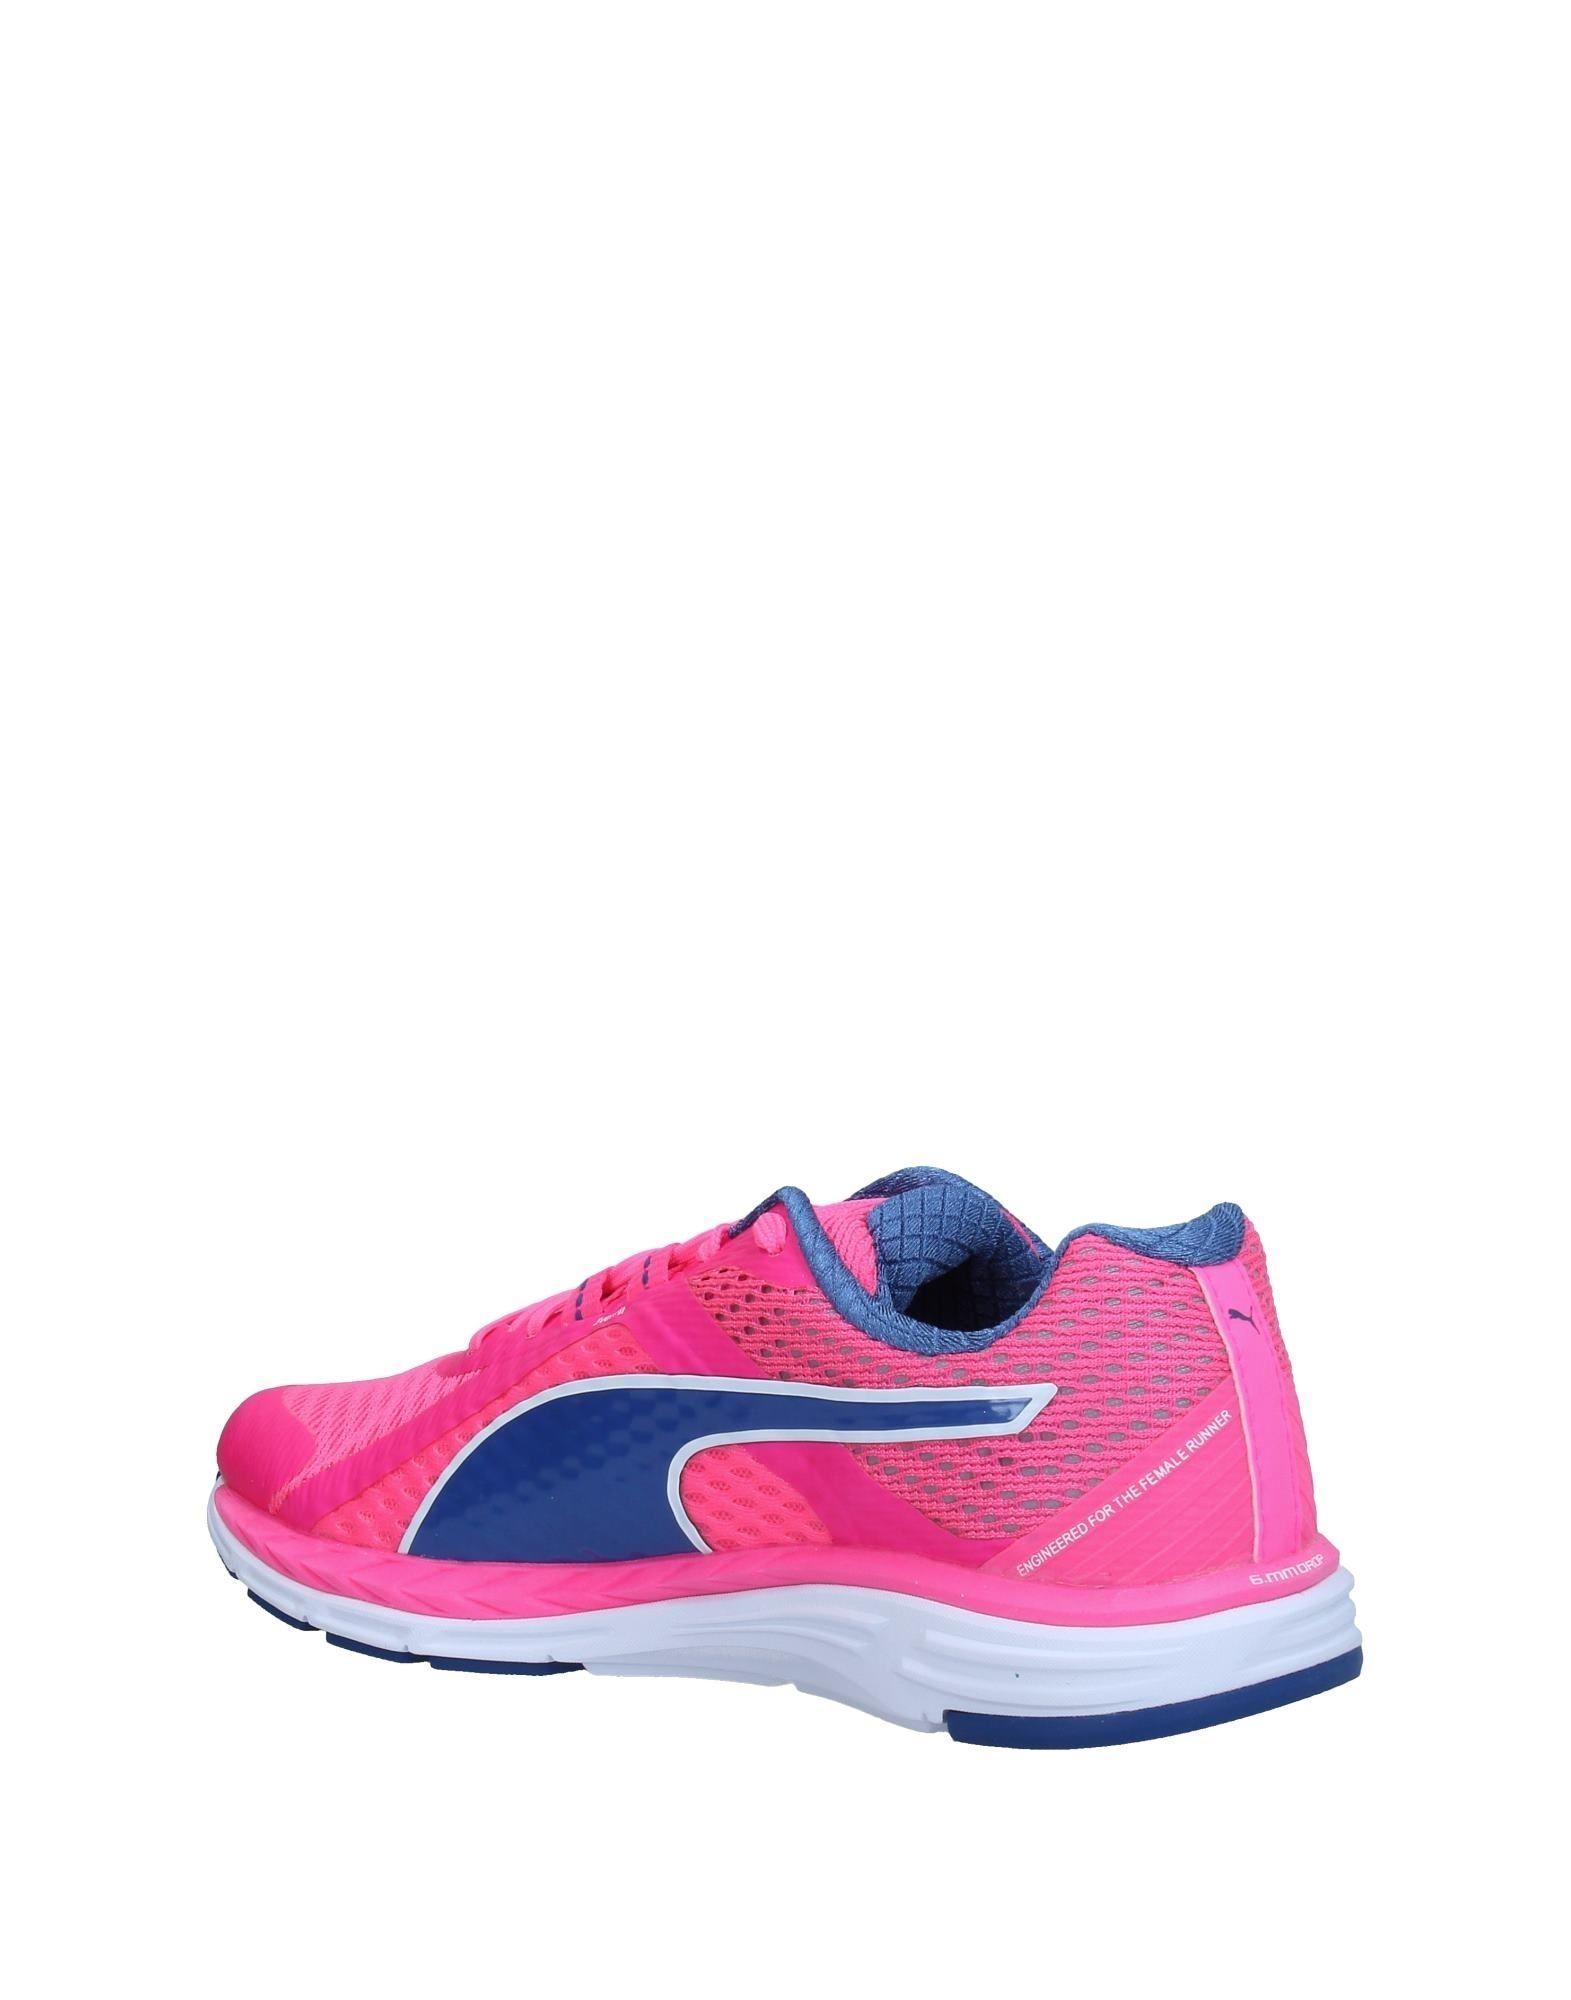 Puma Heiße Sneakers Damen  11333832PX Heiße Puma Schuhe 98b6b4